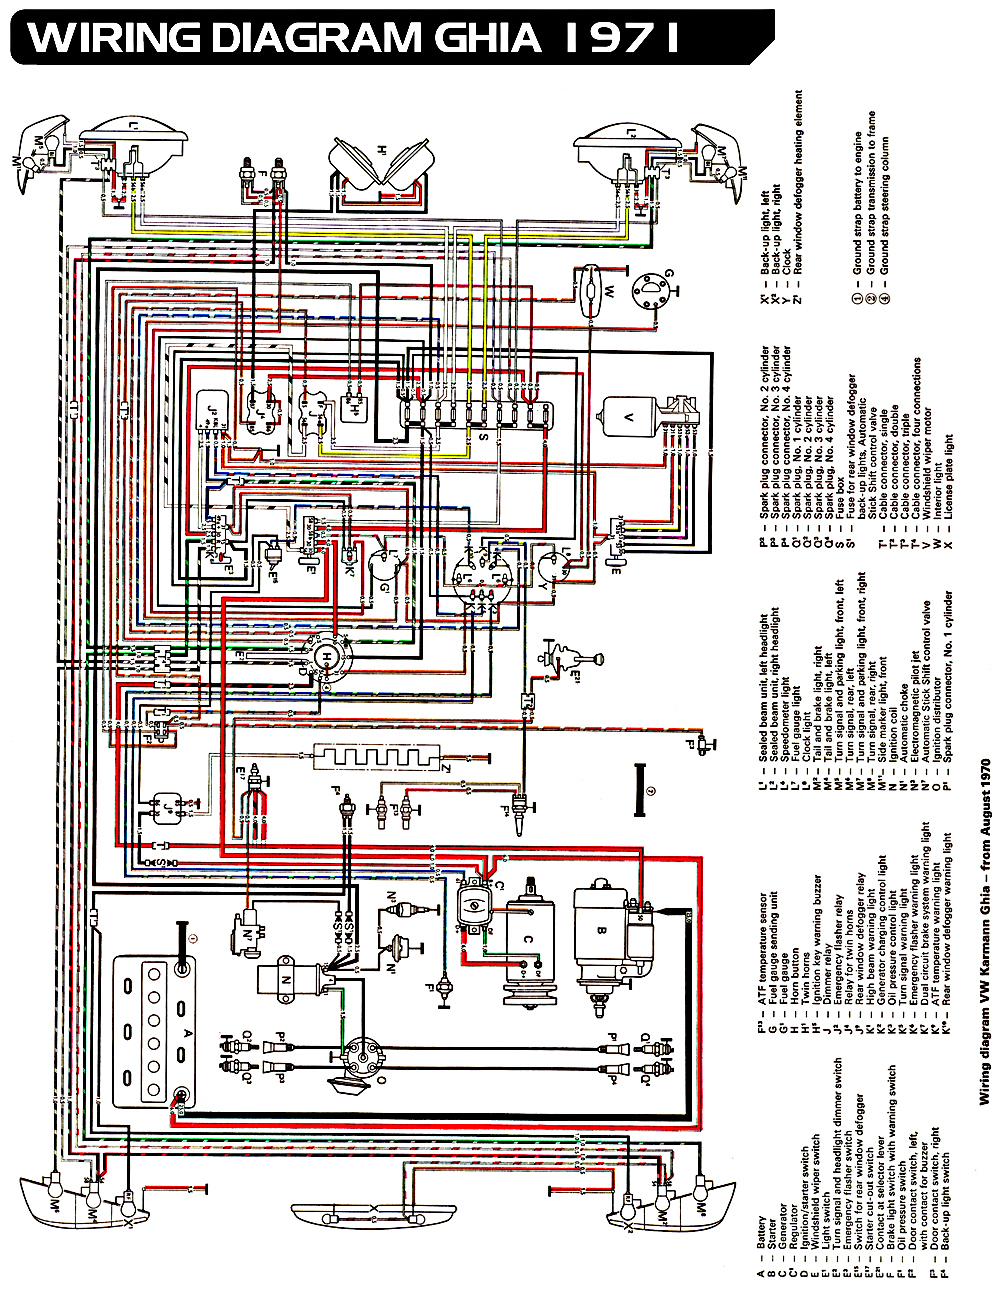 1972 vw beetle wire schematic 1963 vw bug wiring wiring diagrams show  1963 vw bug wiring wiring diagrams show